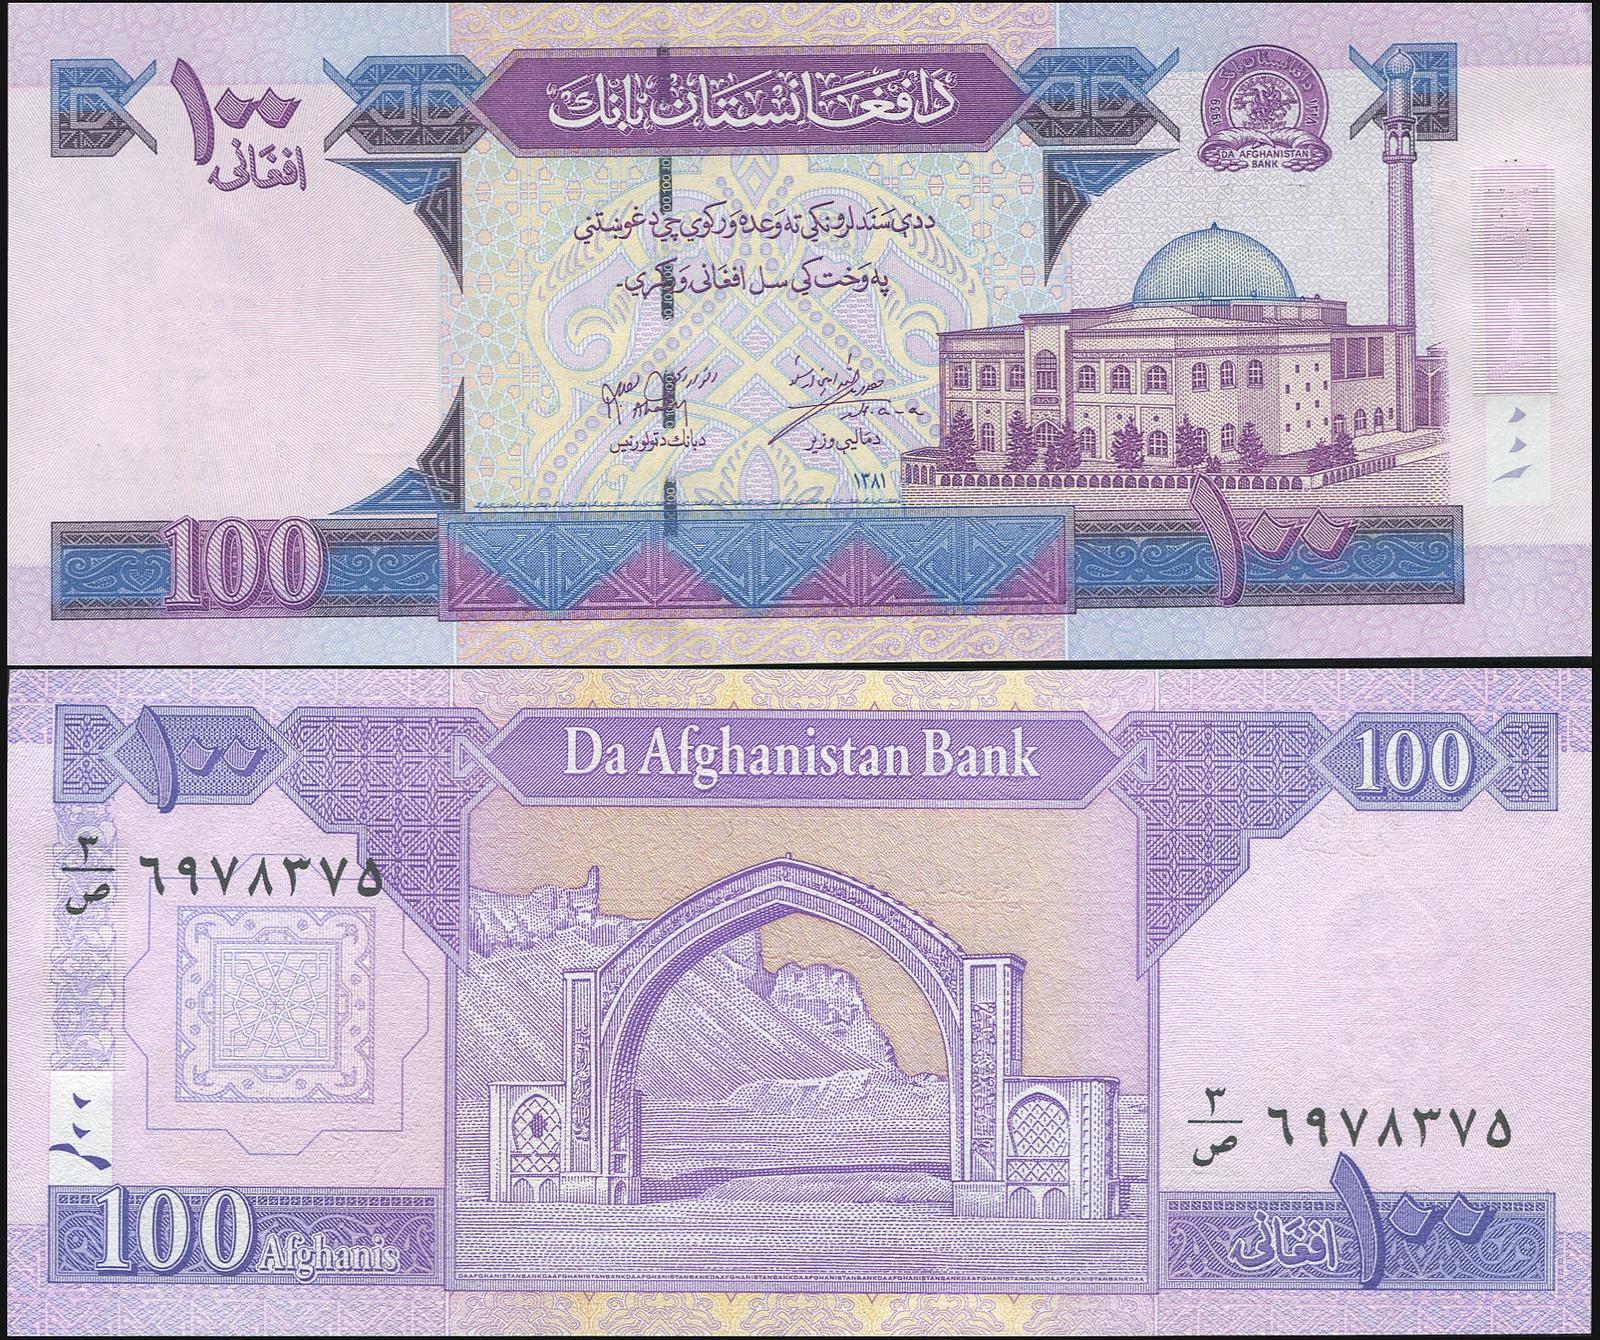 Афганистан 100 афгани (2002) UNC. Банкнота Кат.P.70a showkat ganie and shajr ul amin antioxidant